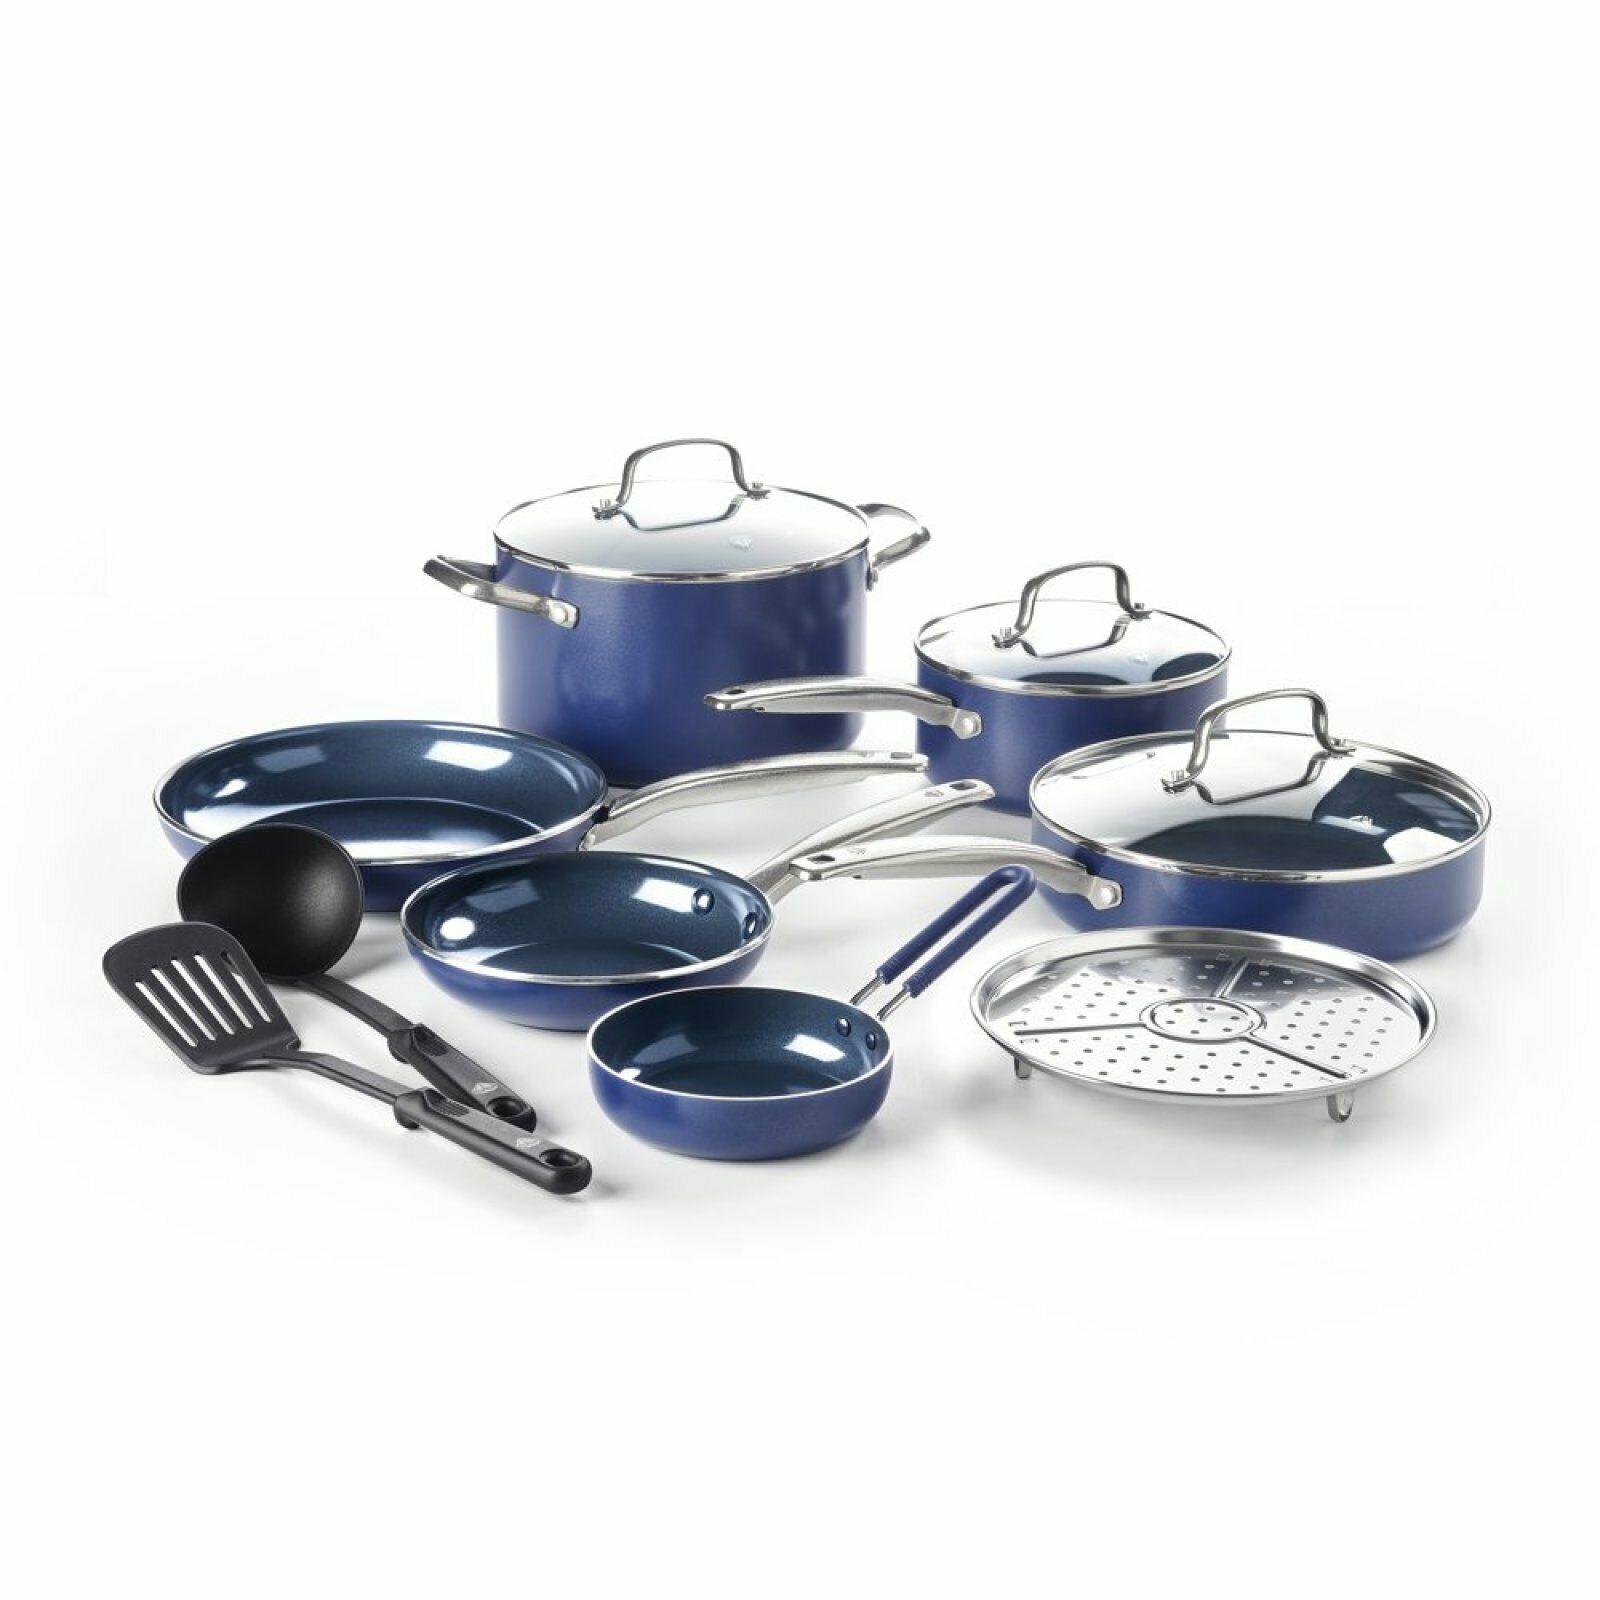 Details About Blue Diamond 12 Pc Cookware Set Toxin Free Ceramic